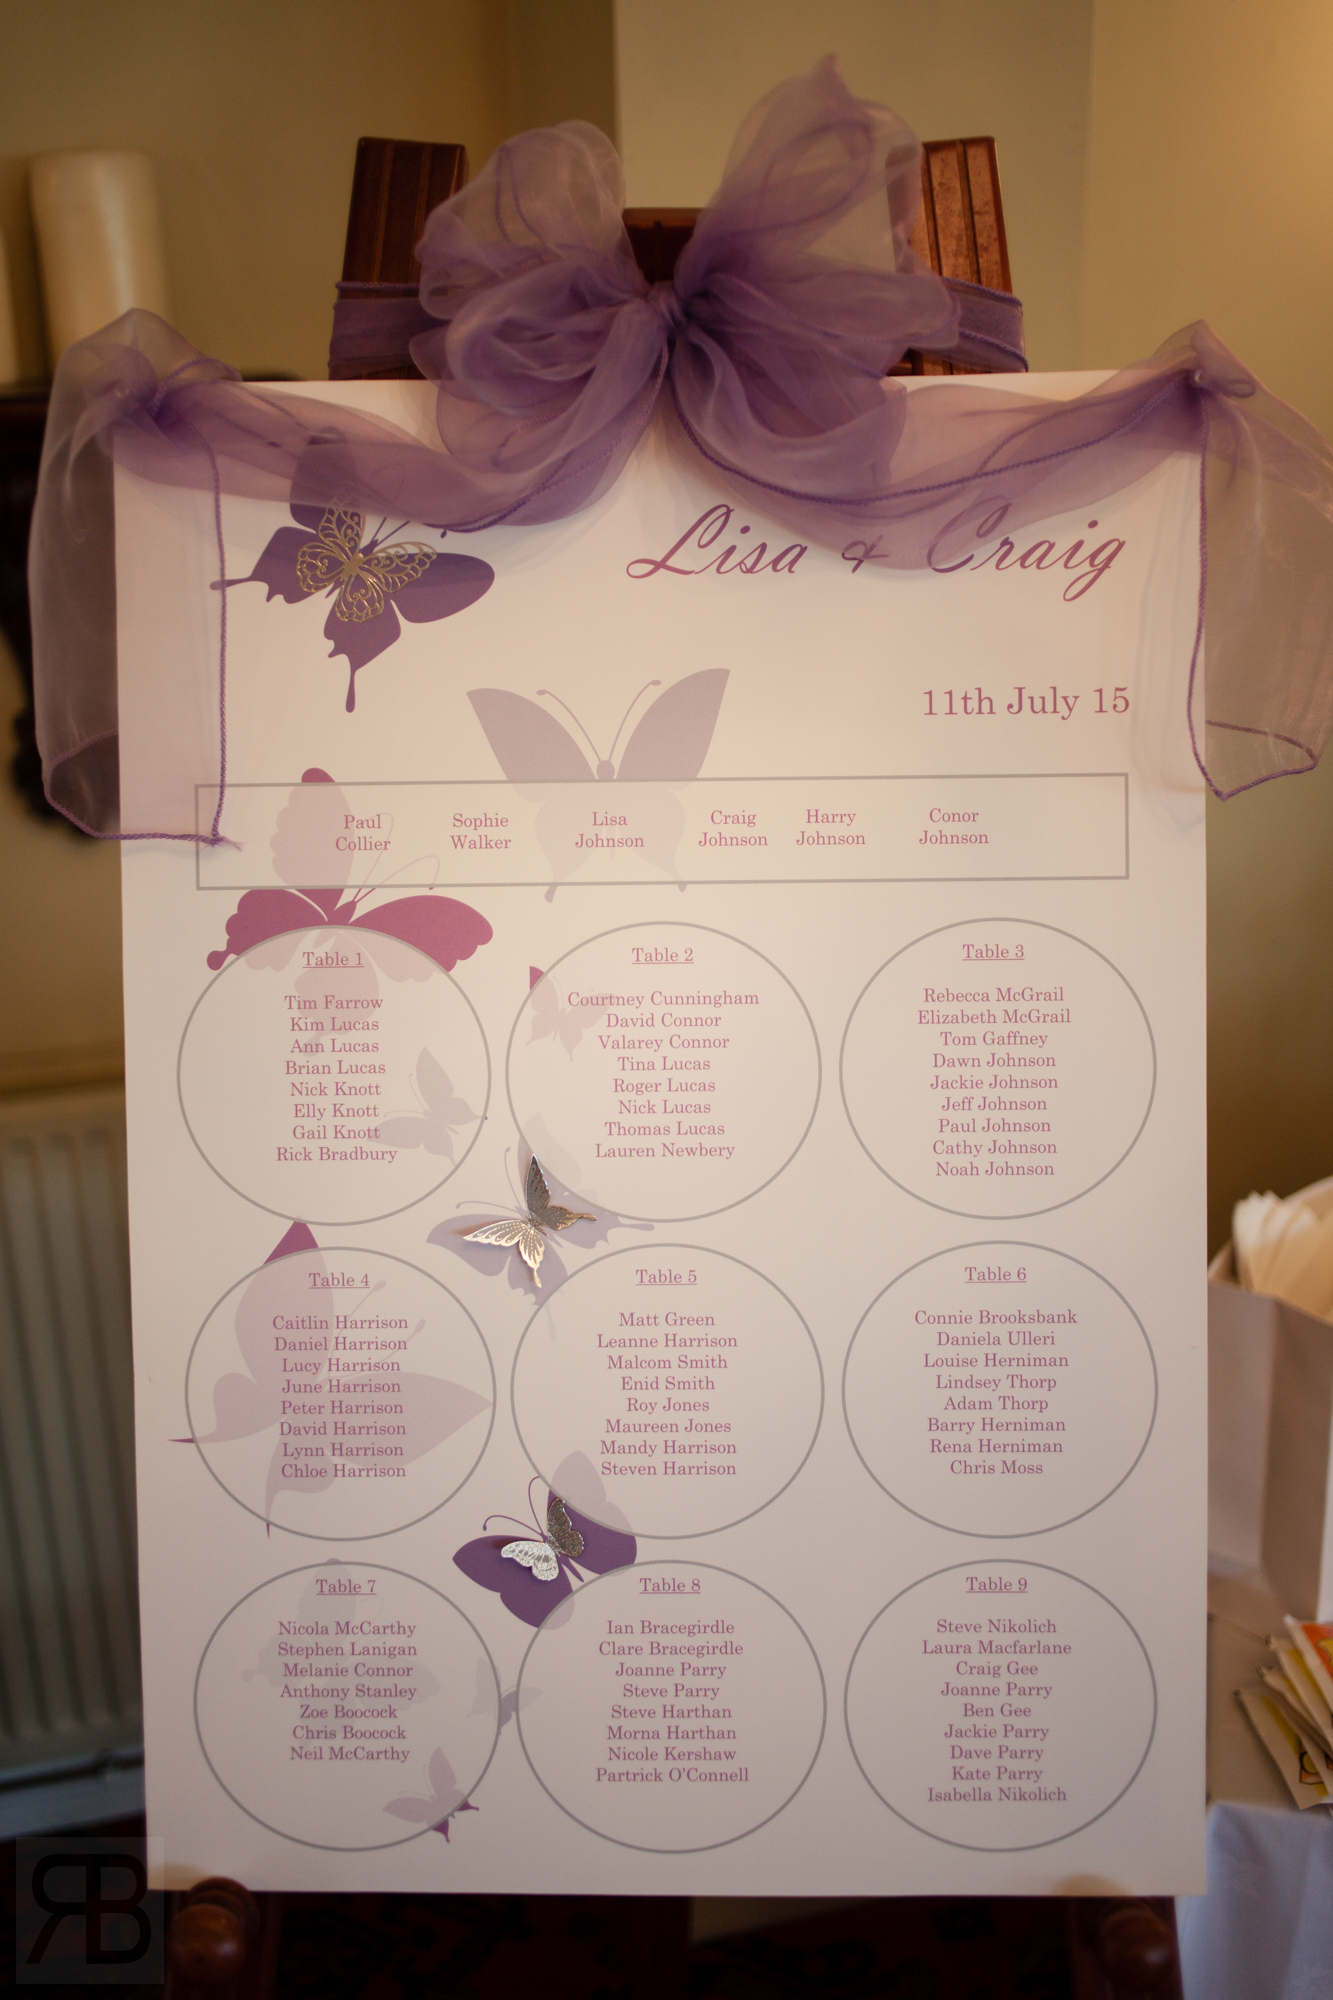 110715_LisaCraigJohnson_Wedding_5411003_WebWM.jpg